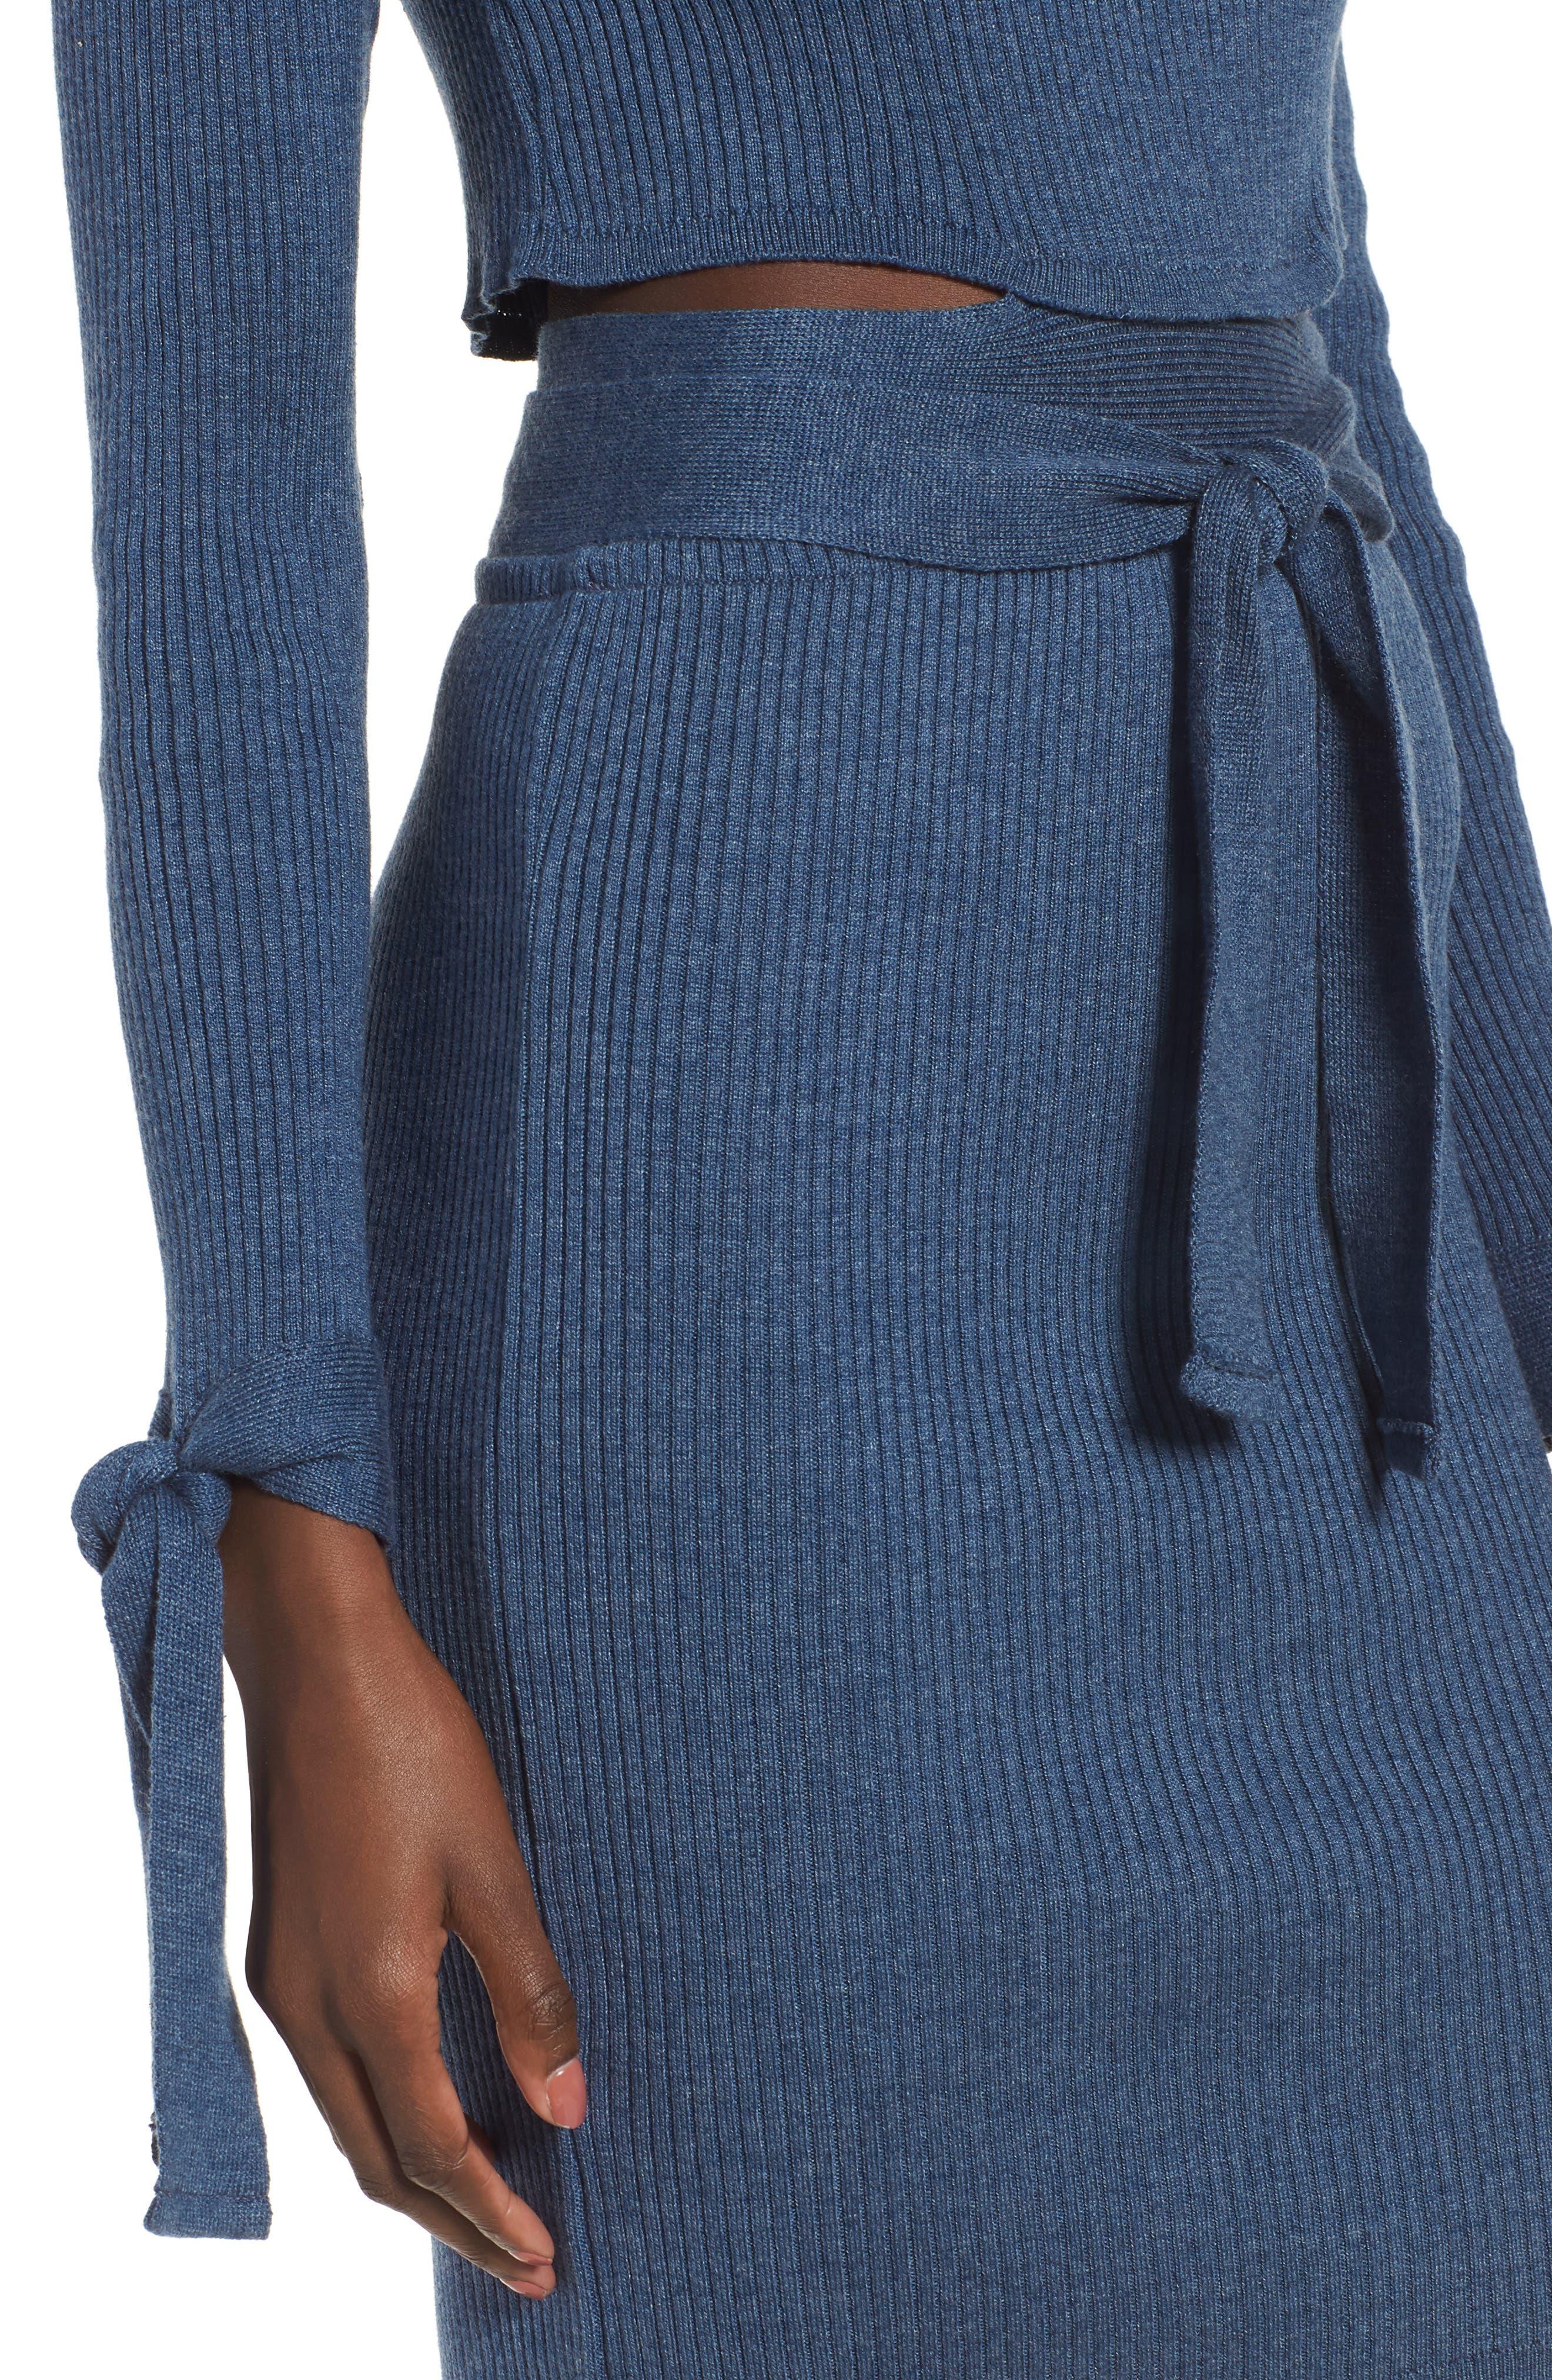 Cutout Body-Con Dress,                             Alternate thumbnail 6, color,                             Blue